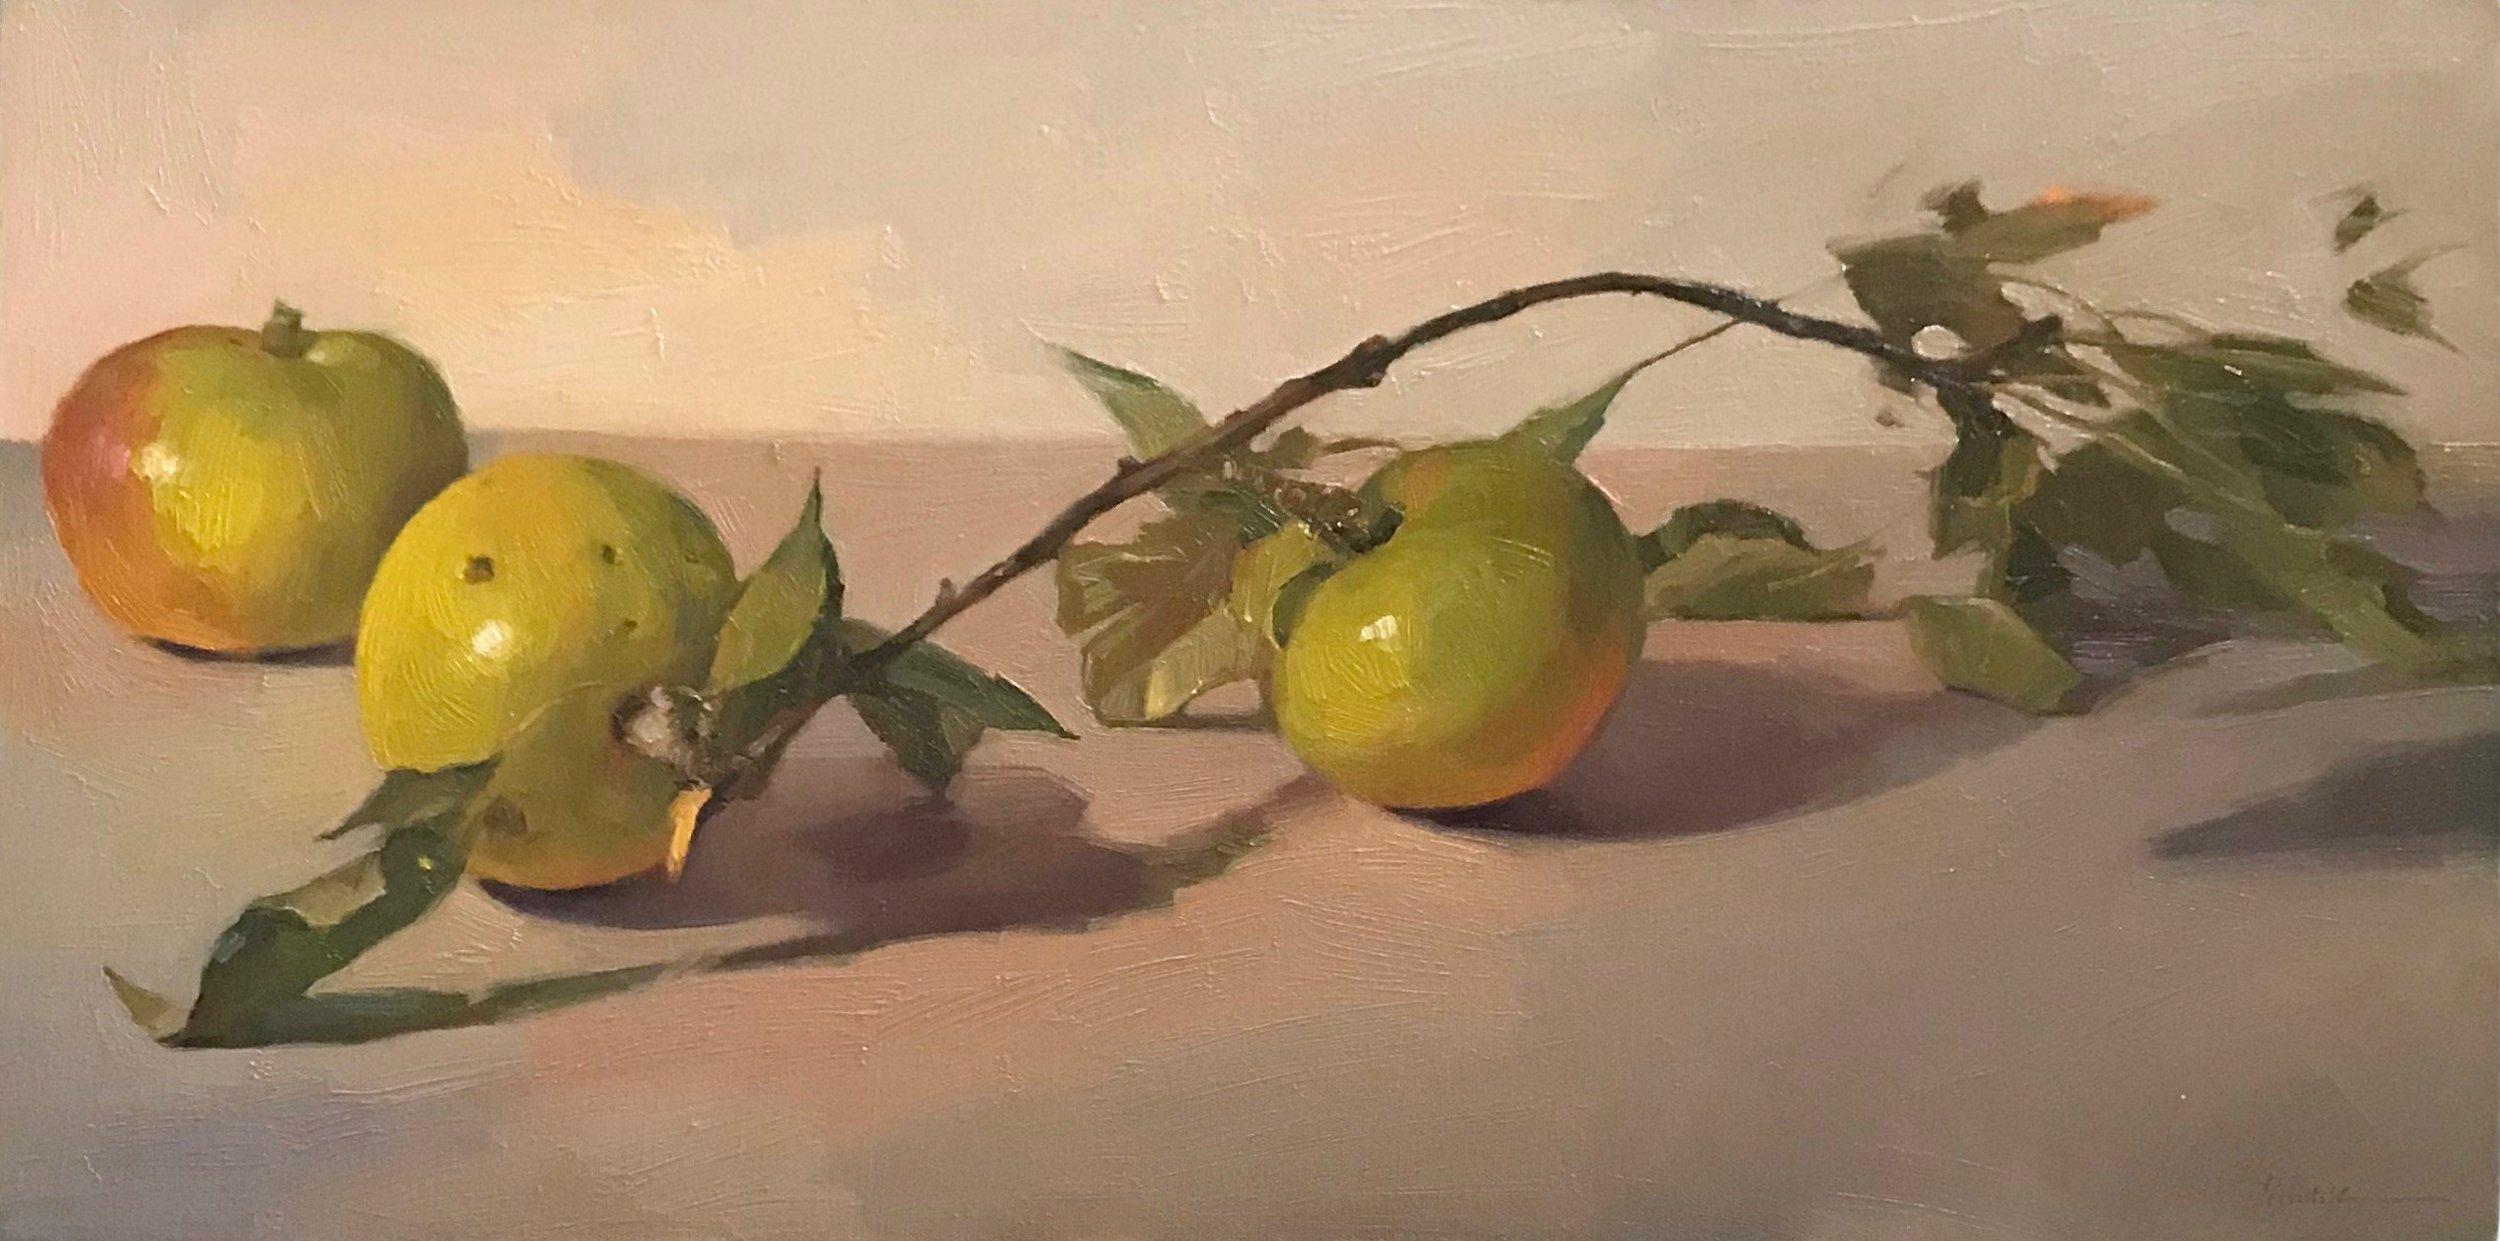 Sarah Sedwick, Early Apples